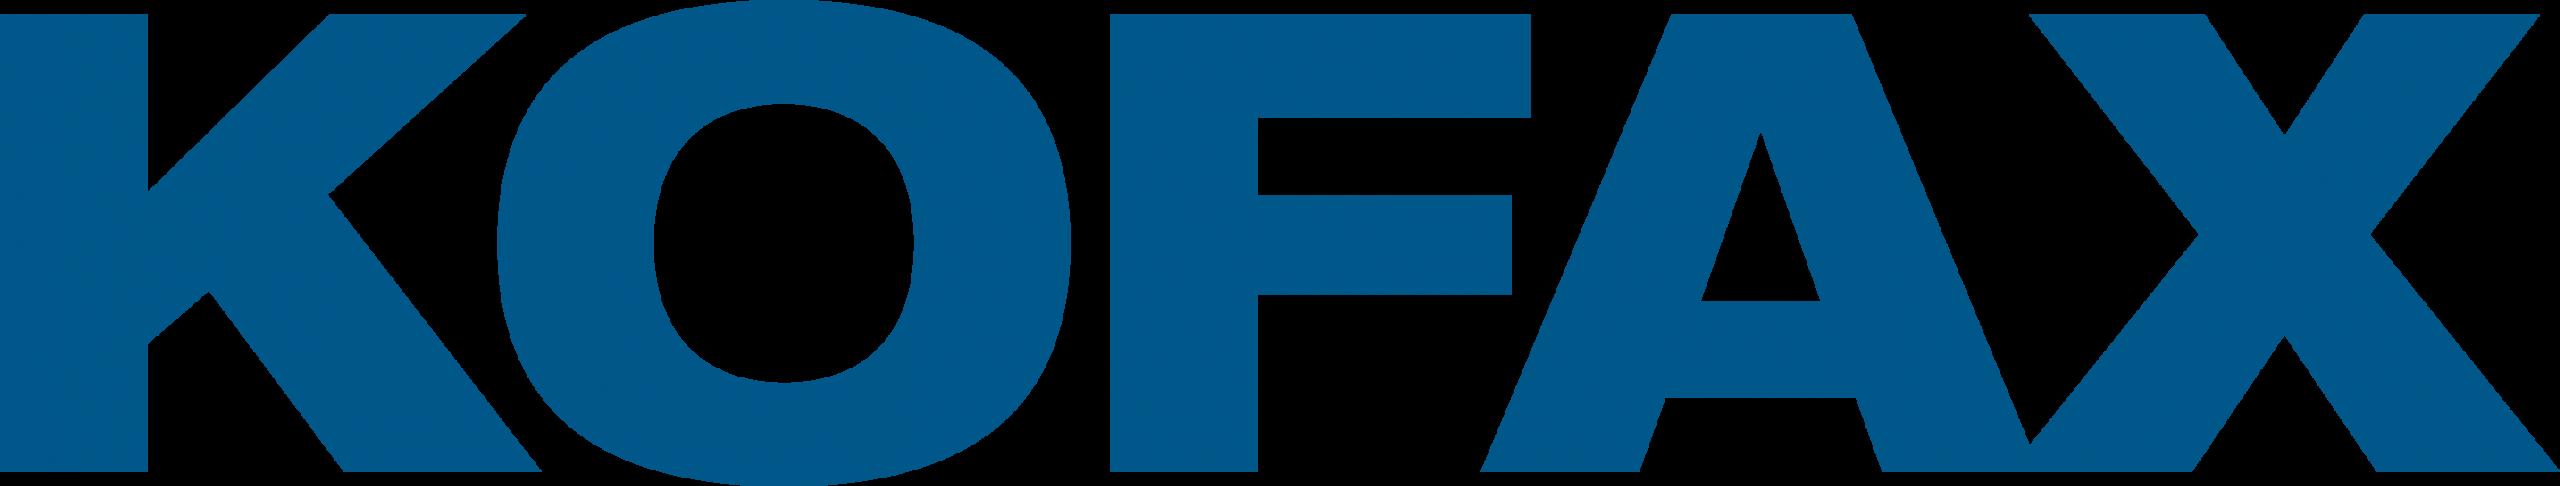 Kofax Logo BLUE